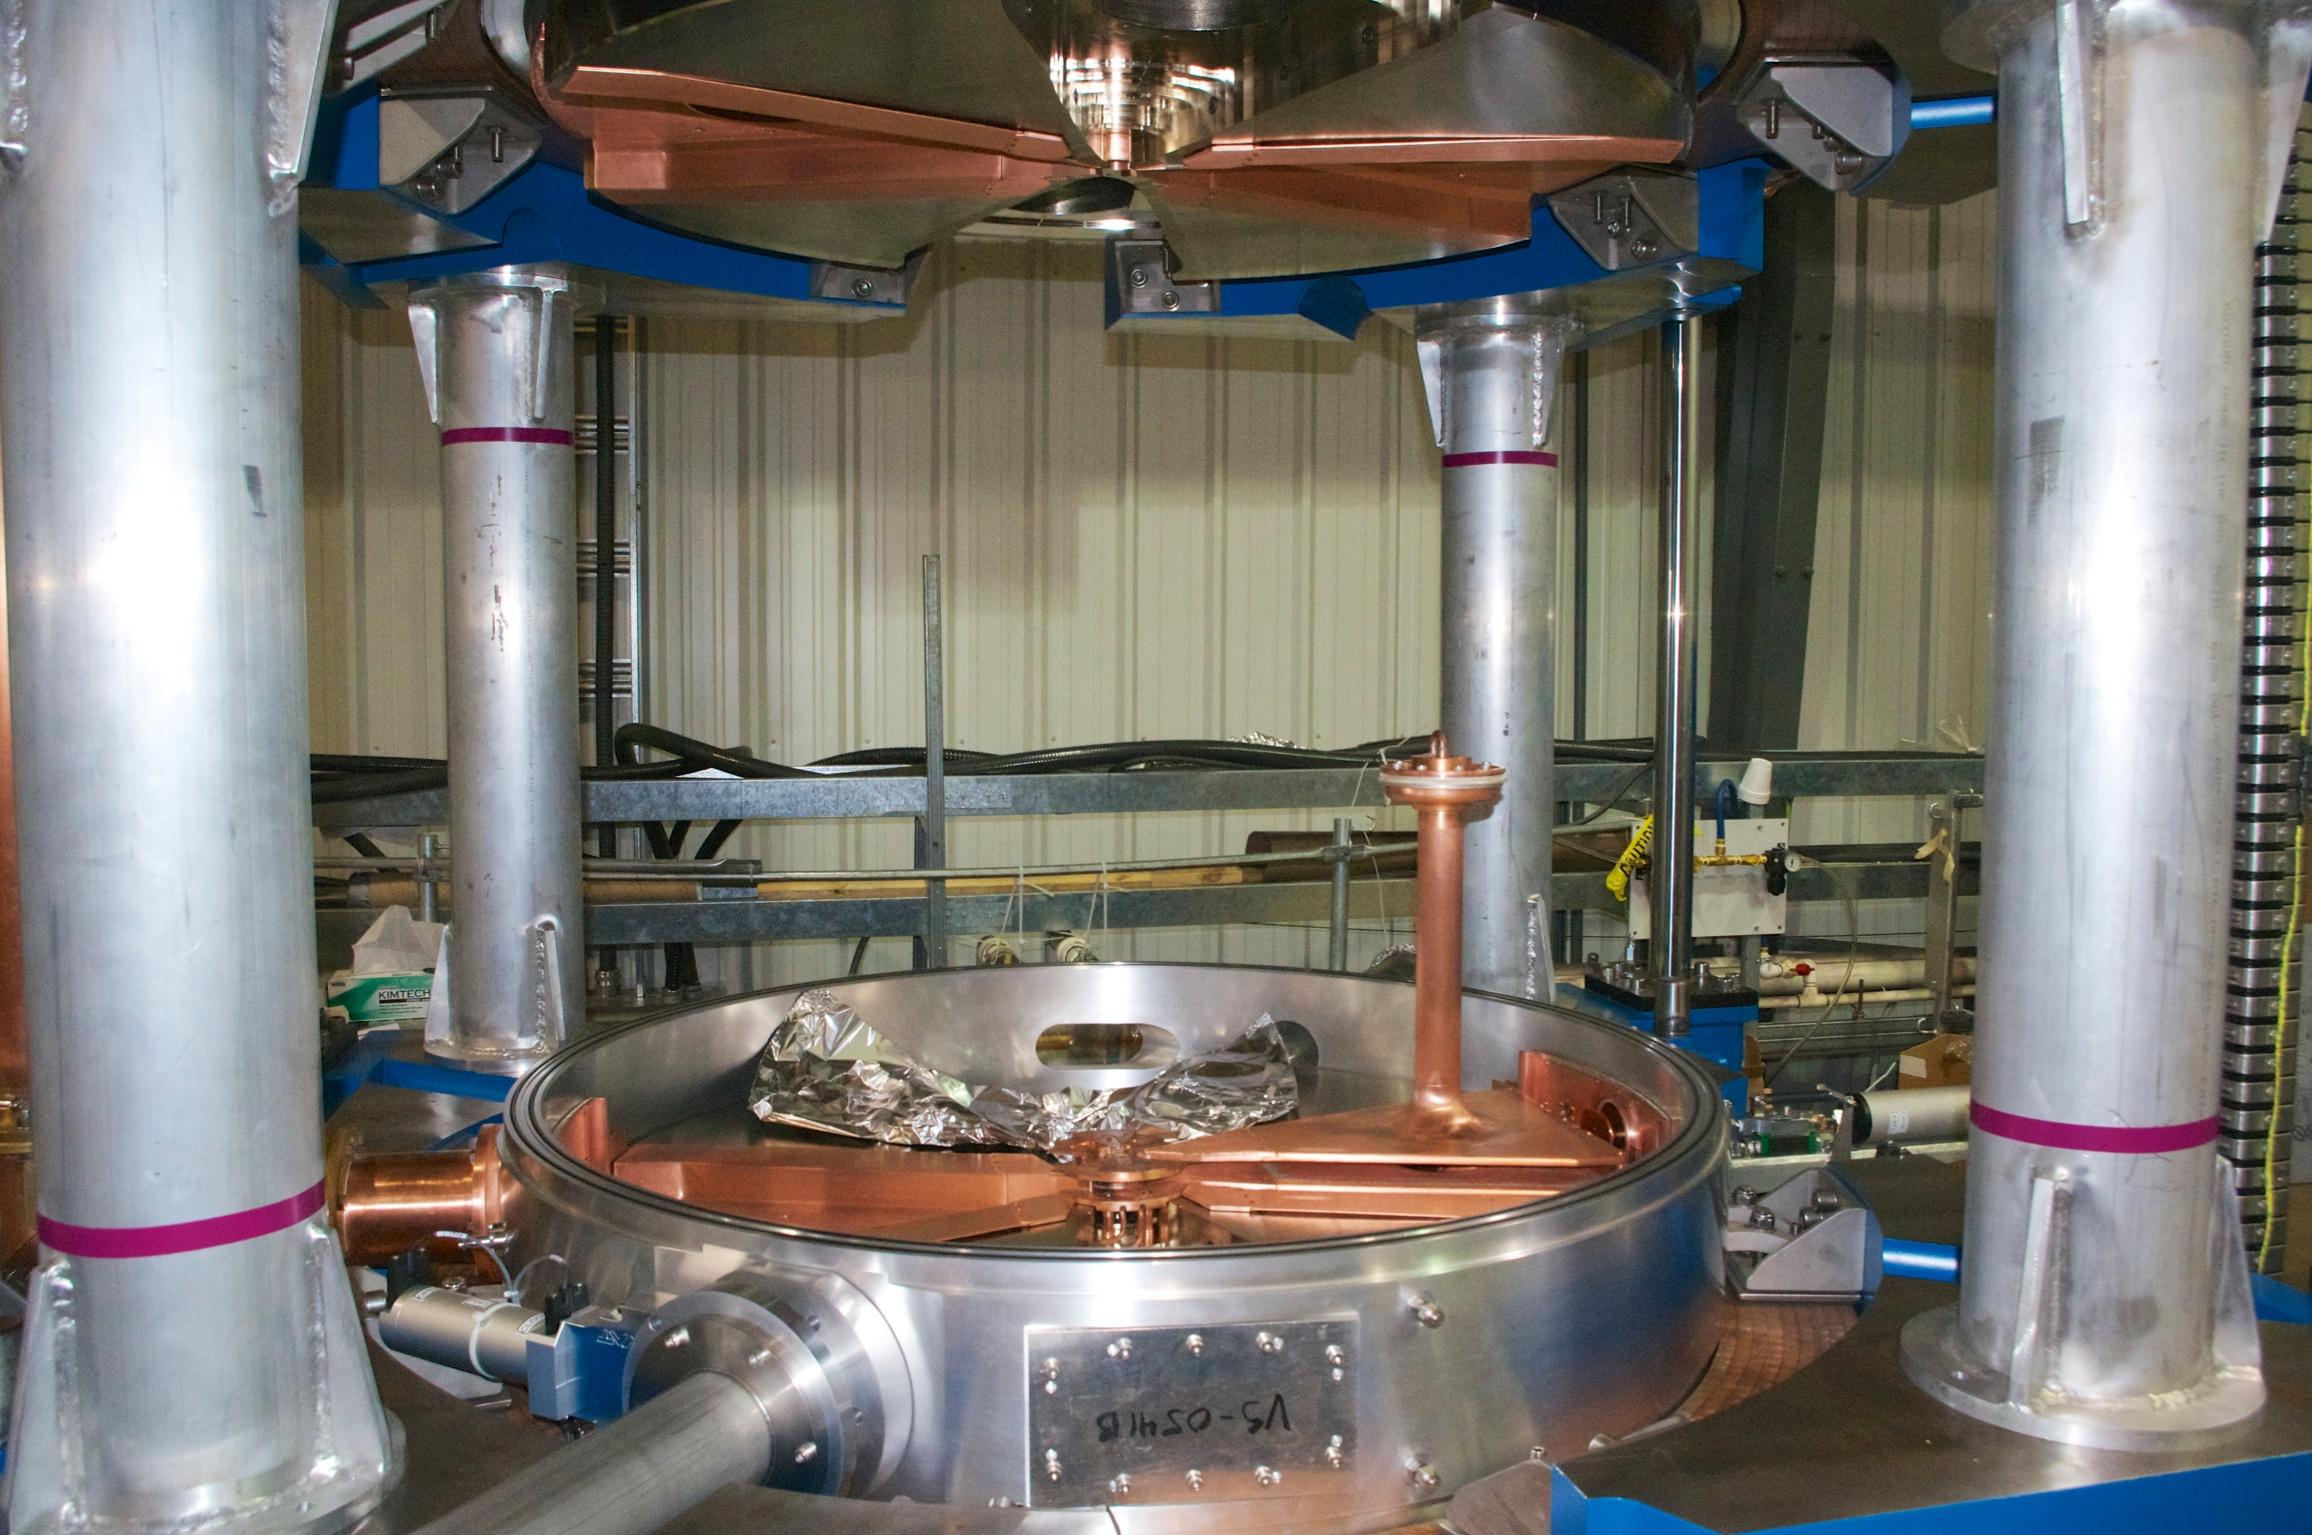 Cyclotron under construction